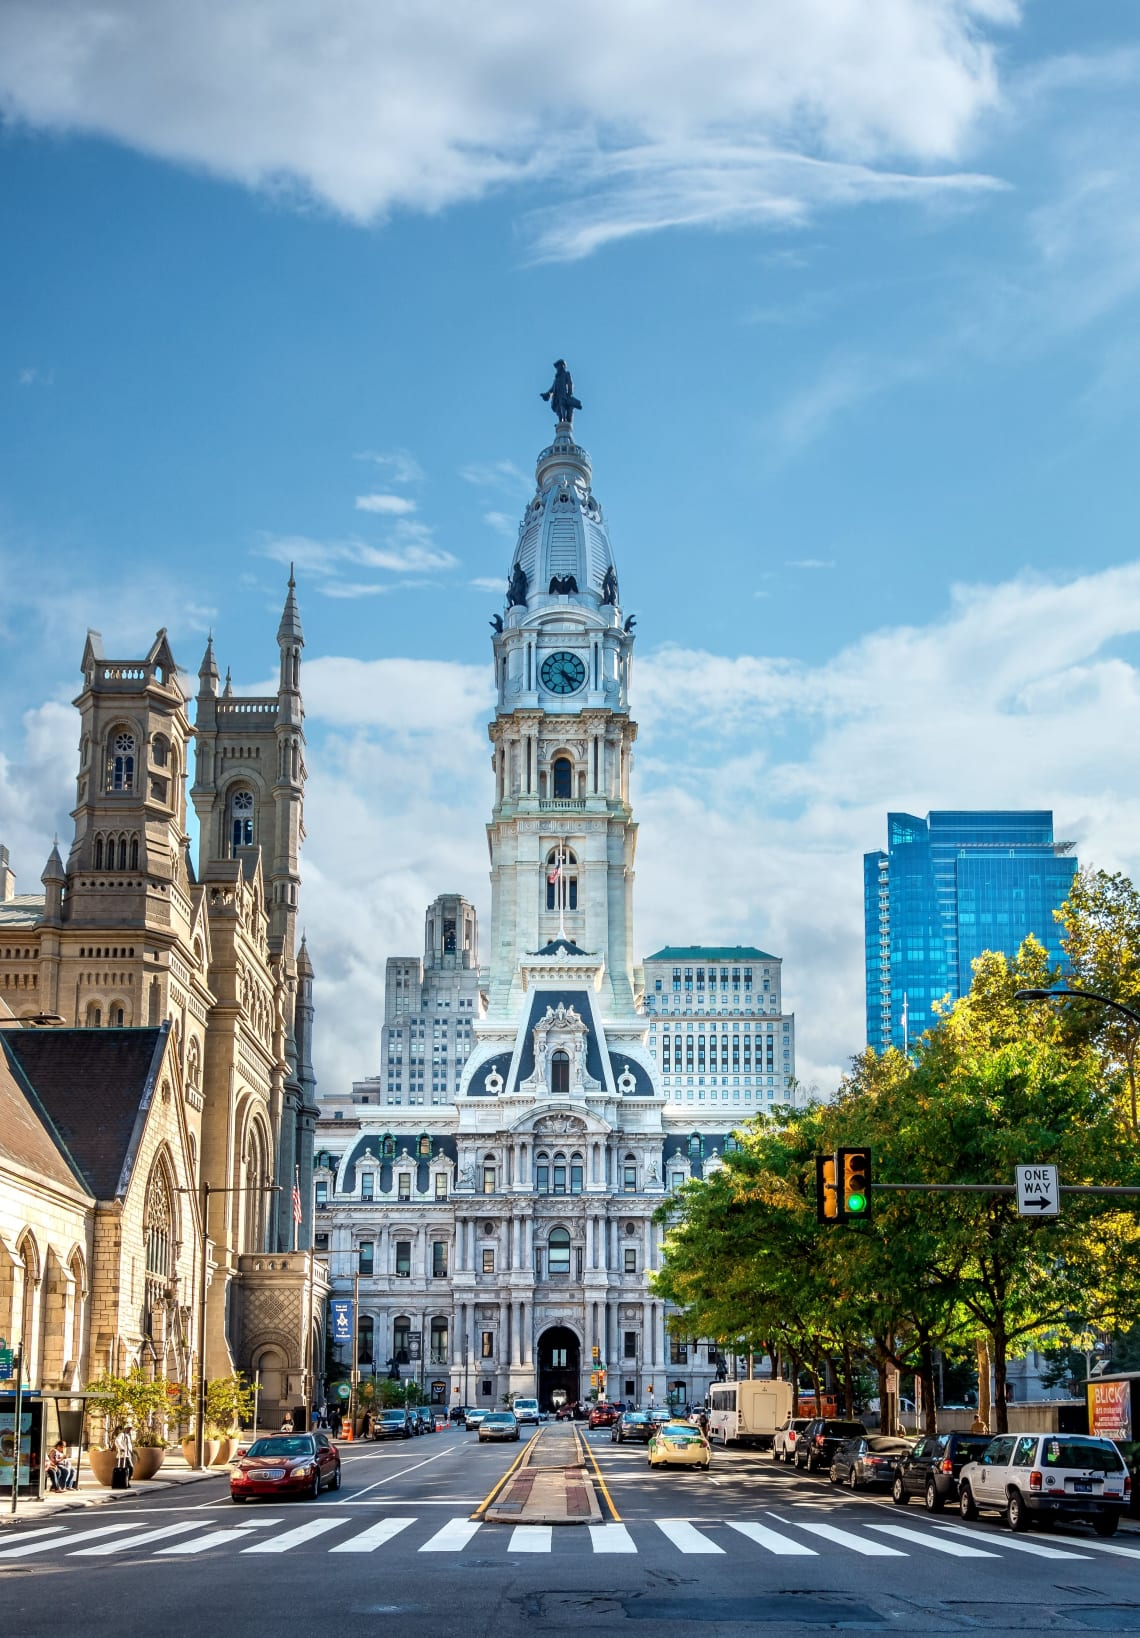 USA travel guide: Pennsylvania